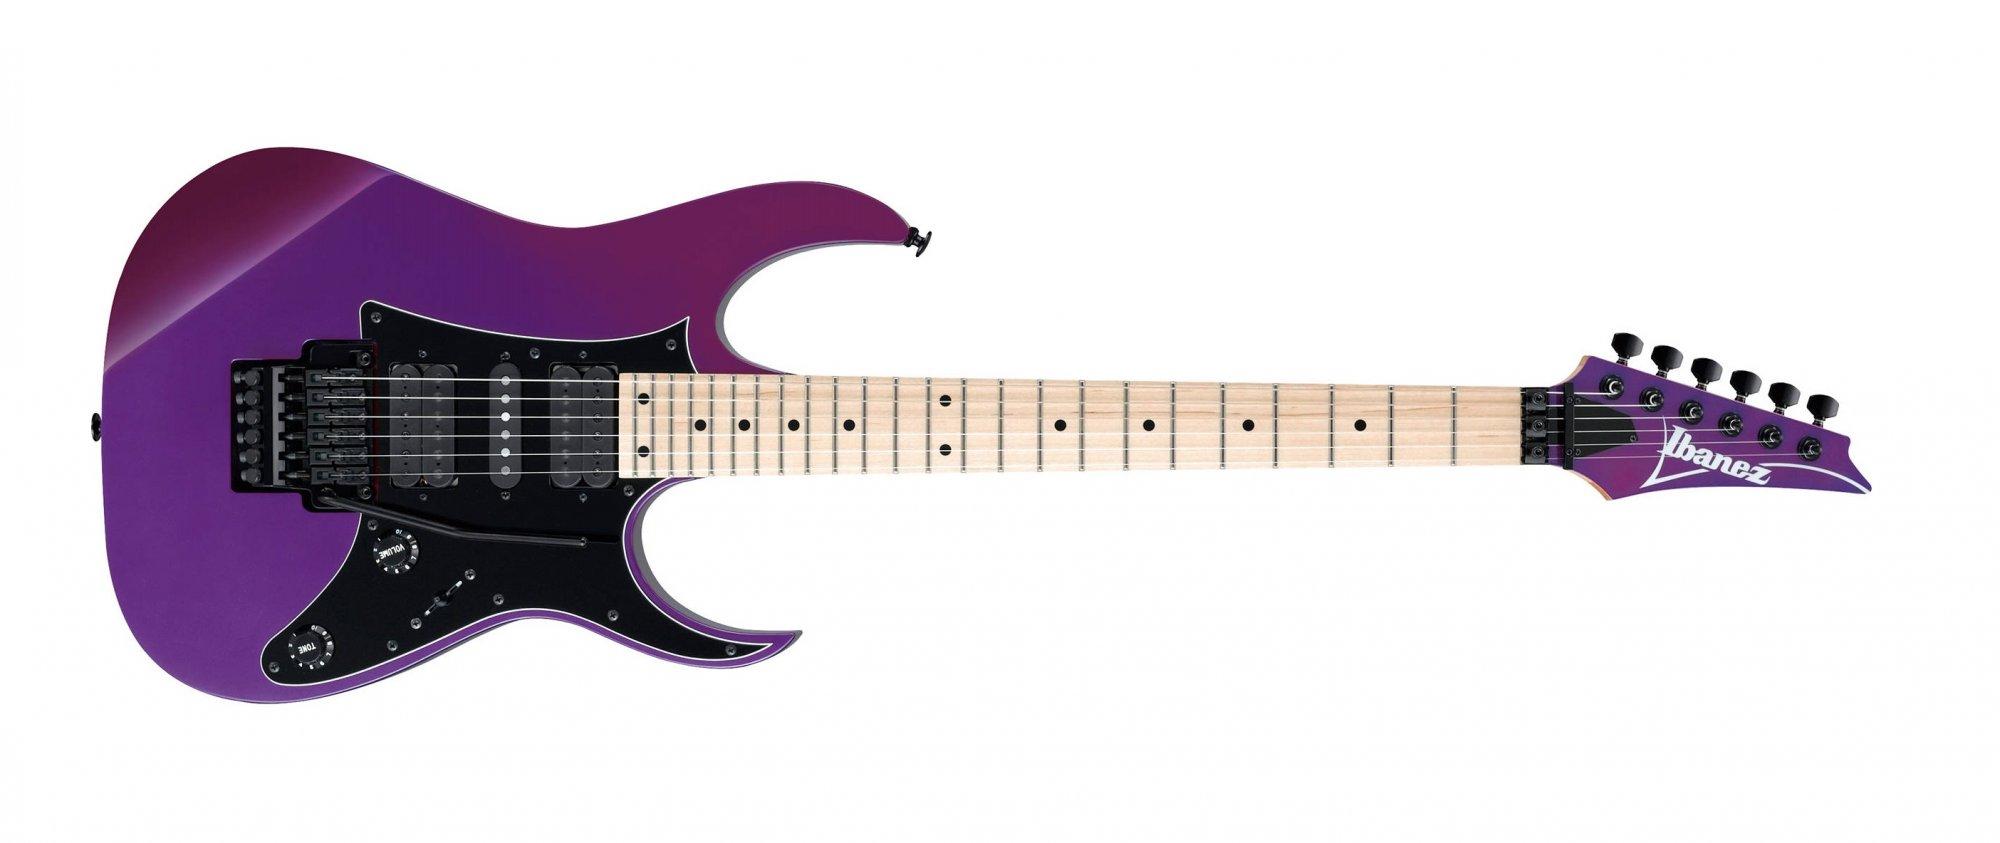 Ibanez RG550 Electric Guitar, Purple Neon